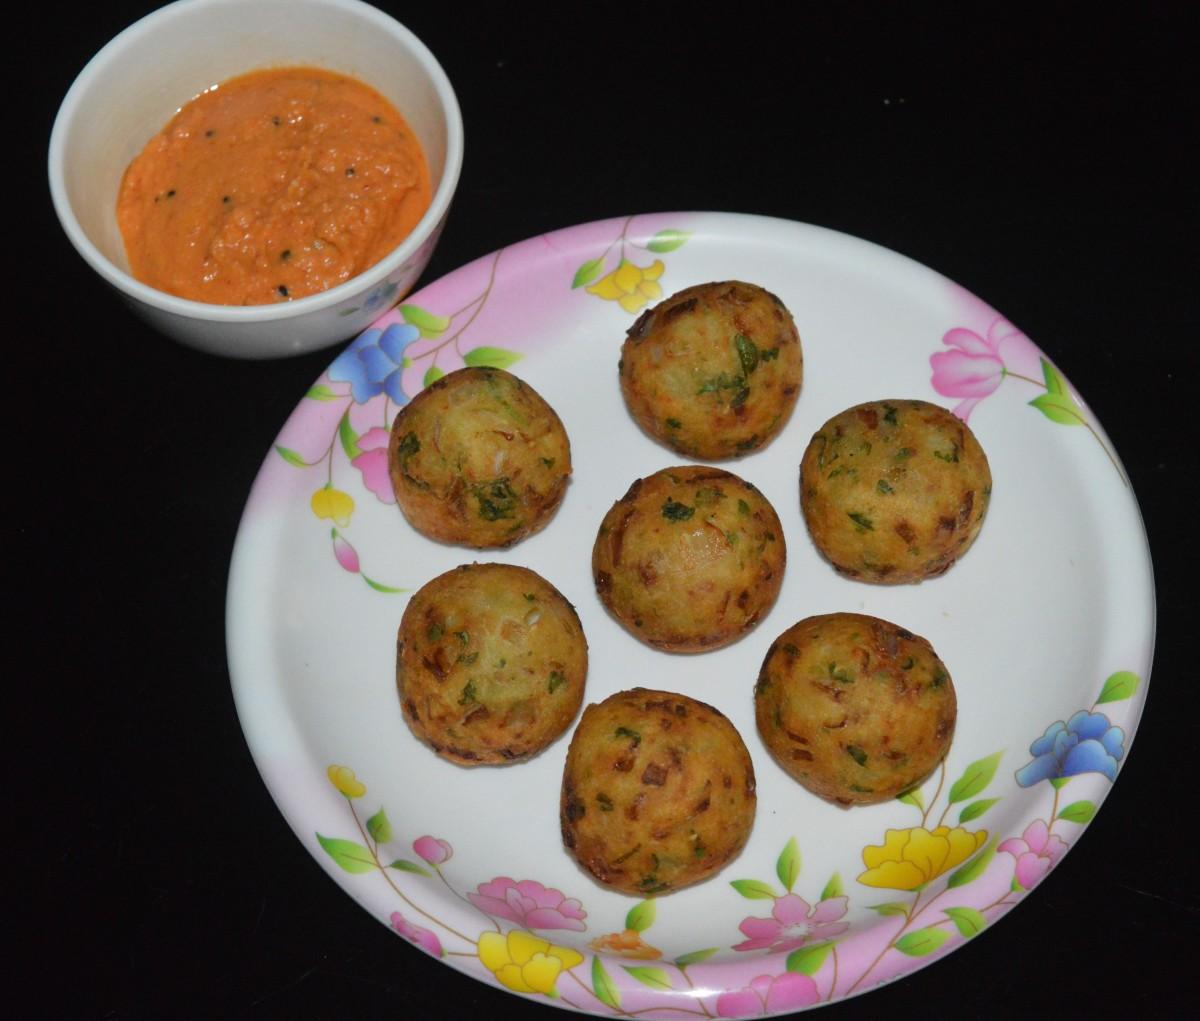 Homemade crunchy, delicious potato and gram flour balls served with onion chutney